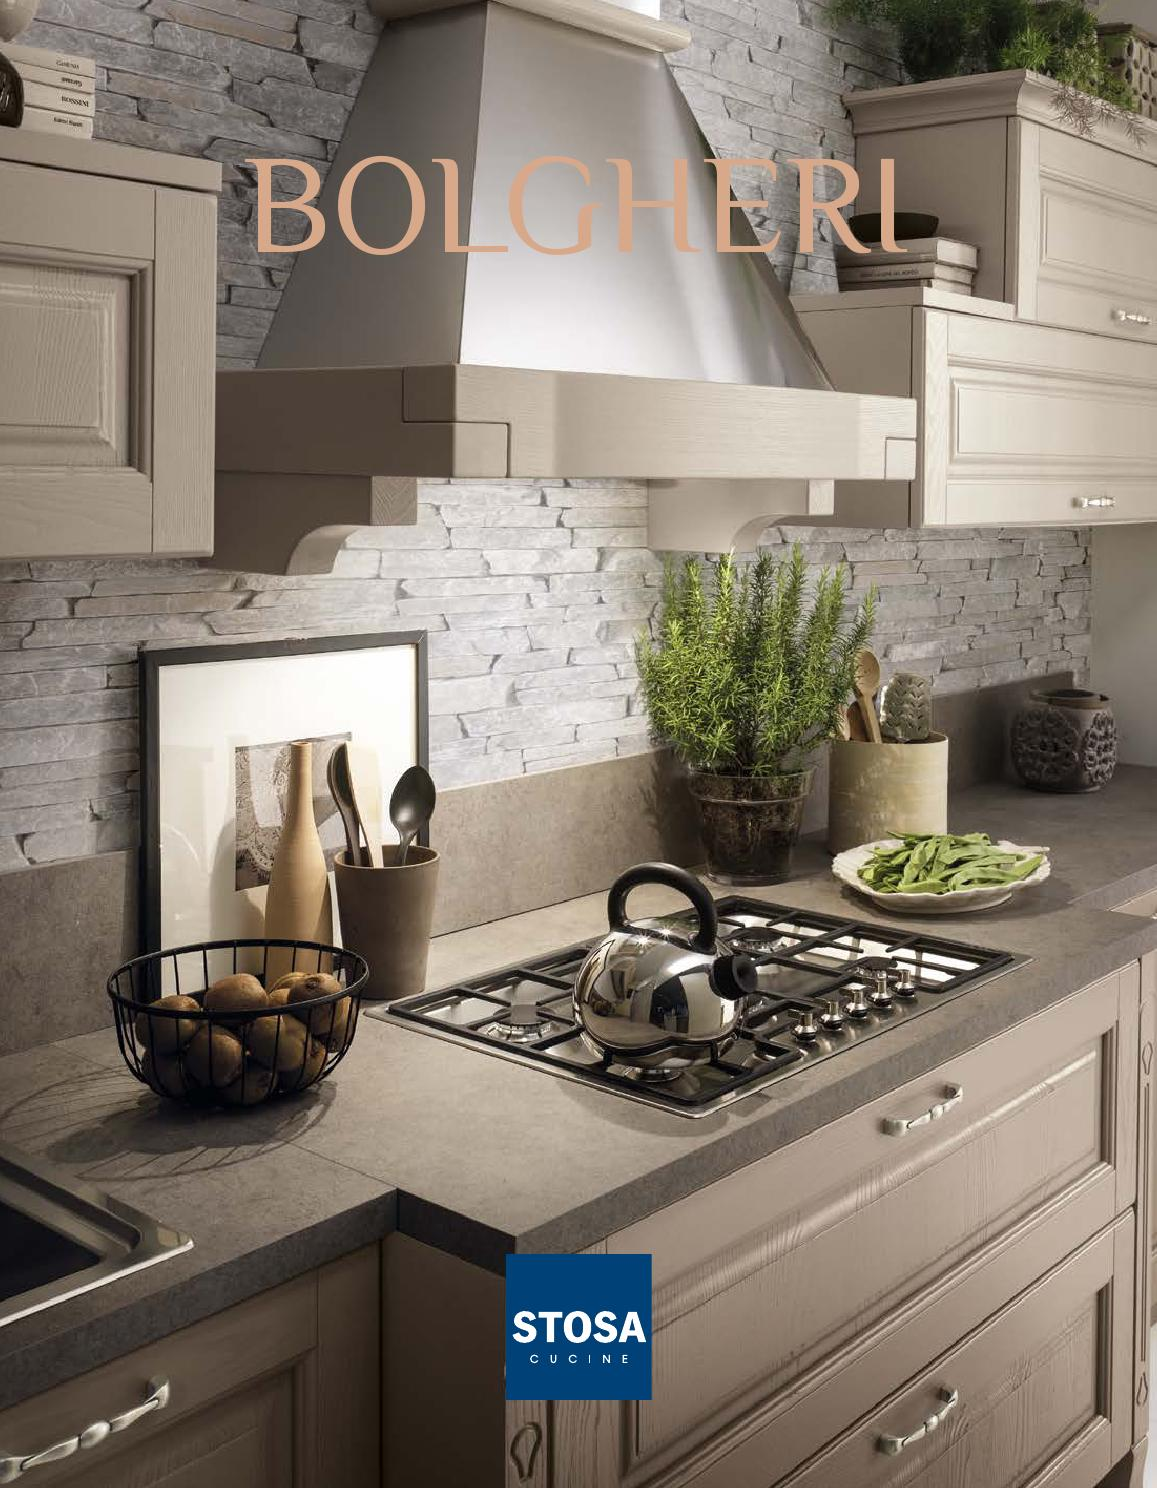 Catalogo cucine classiche stosa bolgheri by STOSA Cucine - issuu